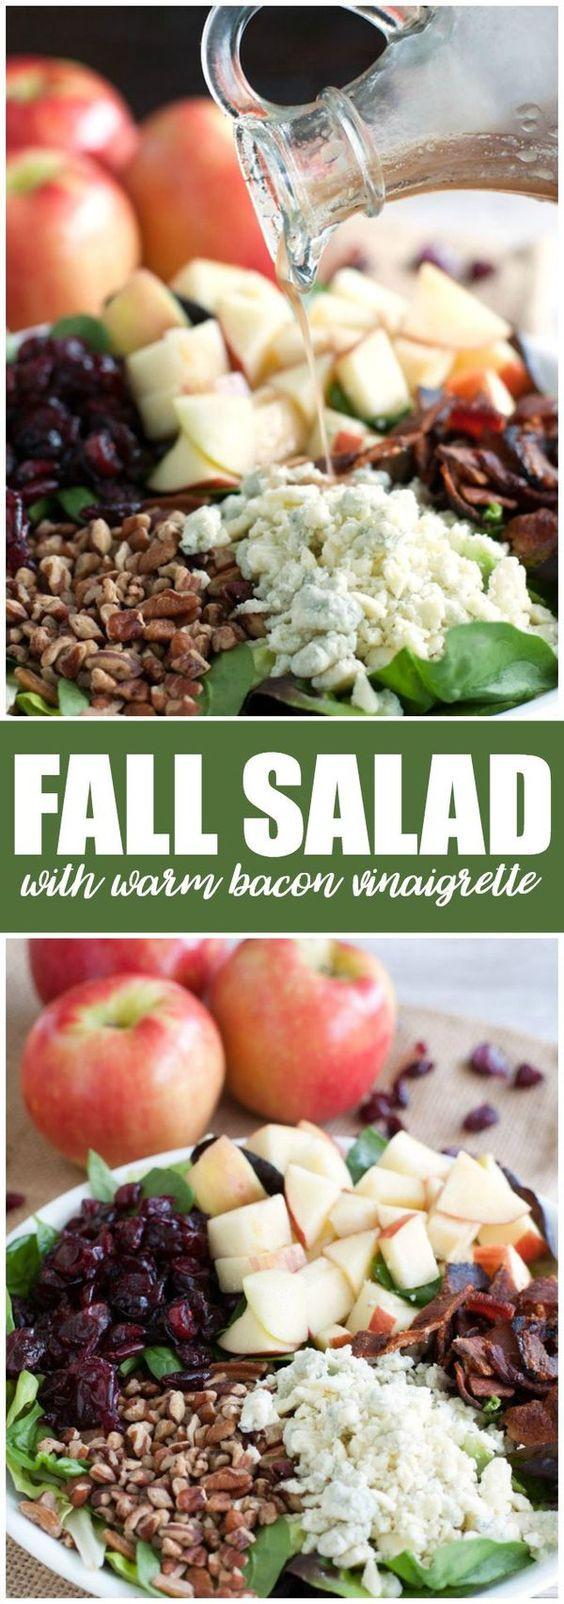 Fall Salad Dressings  Fall Salad with Warm Bacon Vinaigrette Recipe